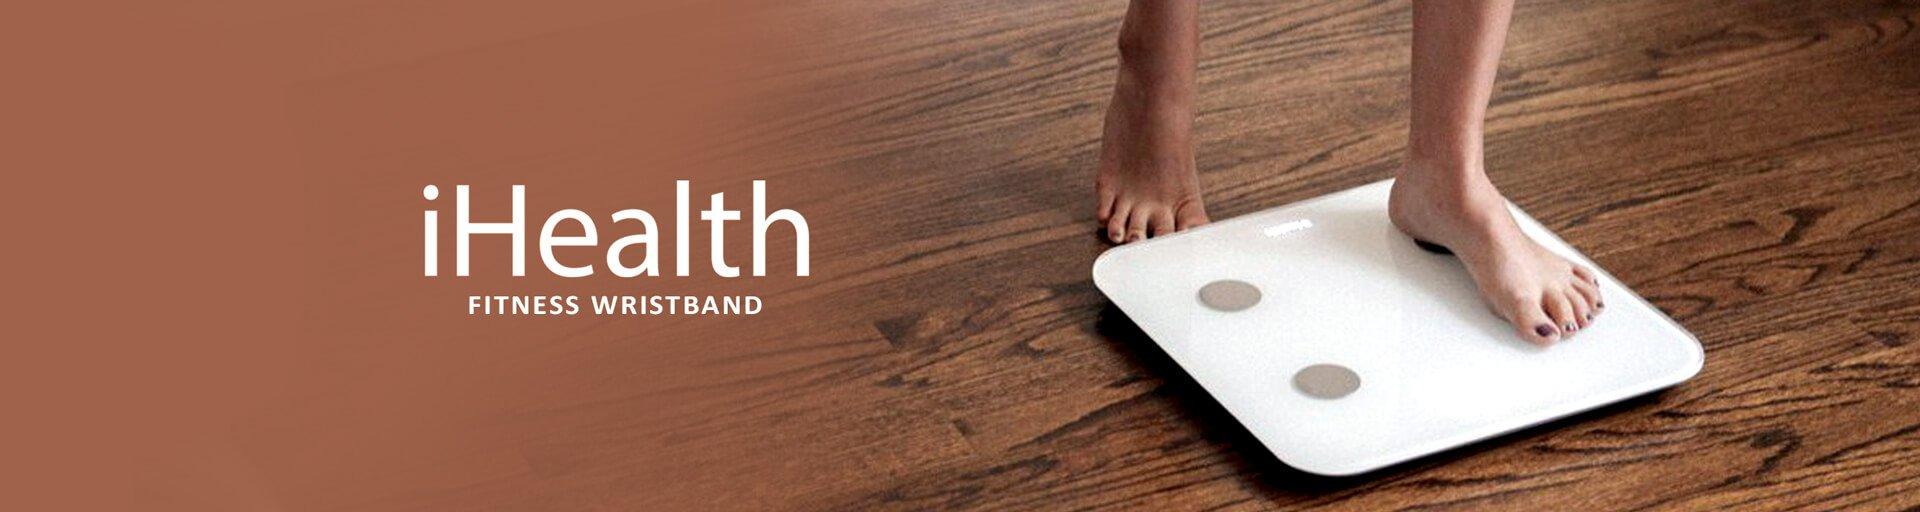 Smart Health & Fitness Equipment